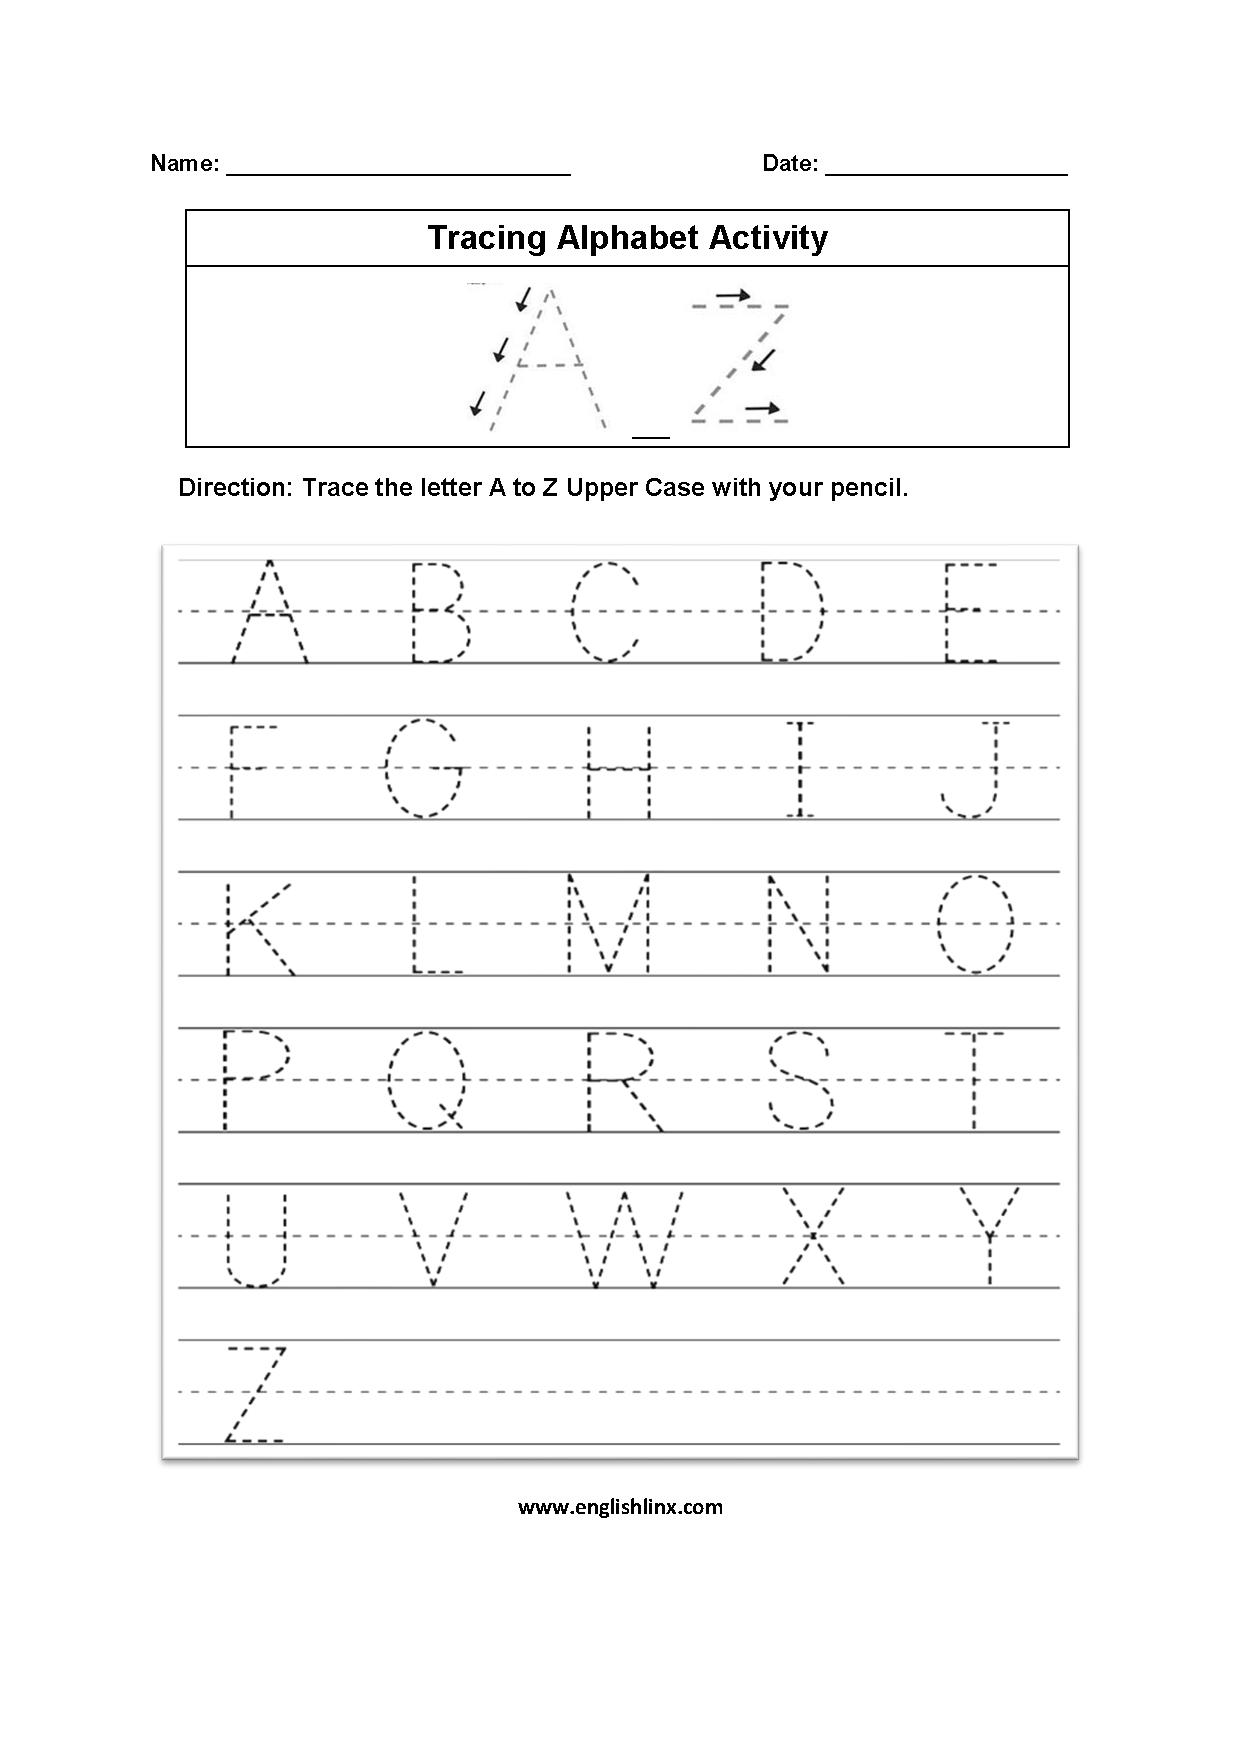 Alphabet Worksheets | Tracing Alphabet Worksheets in Alphabet Tracing Worksheets A-Z